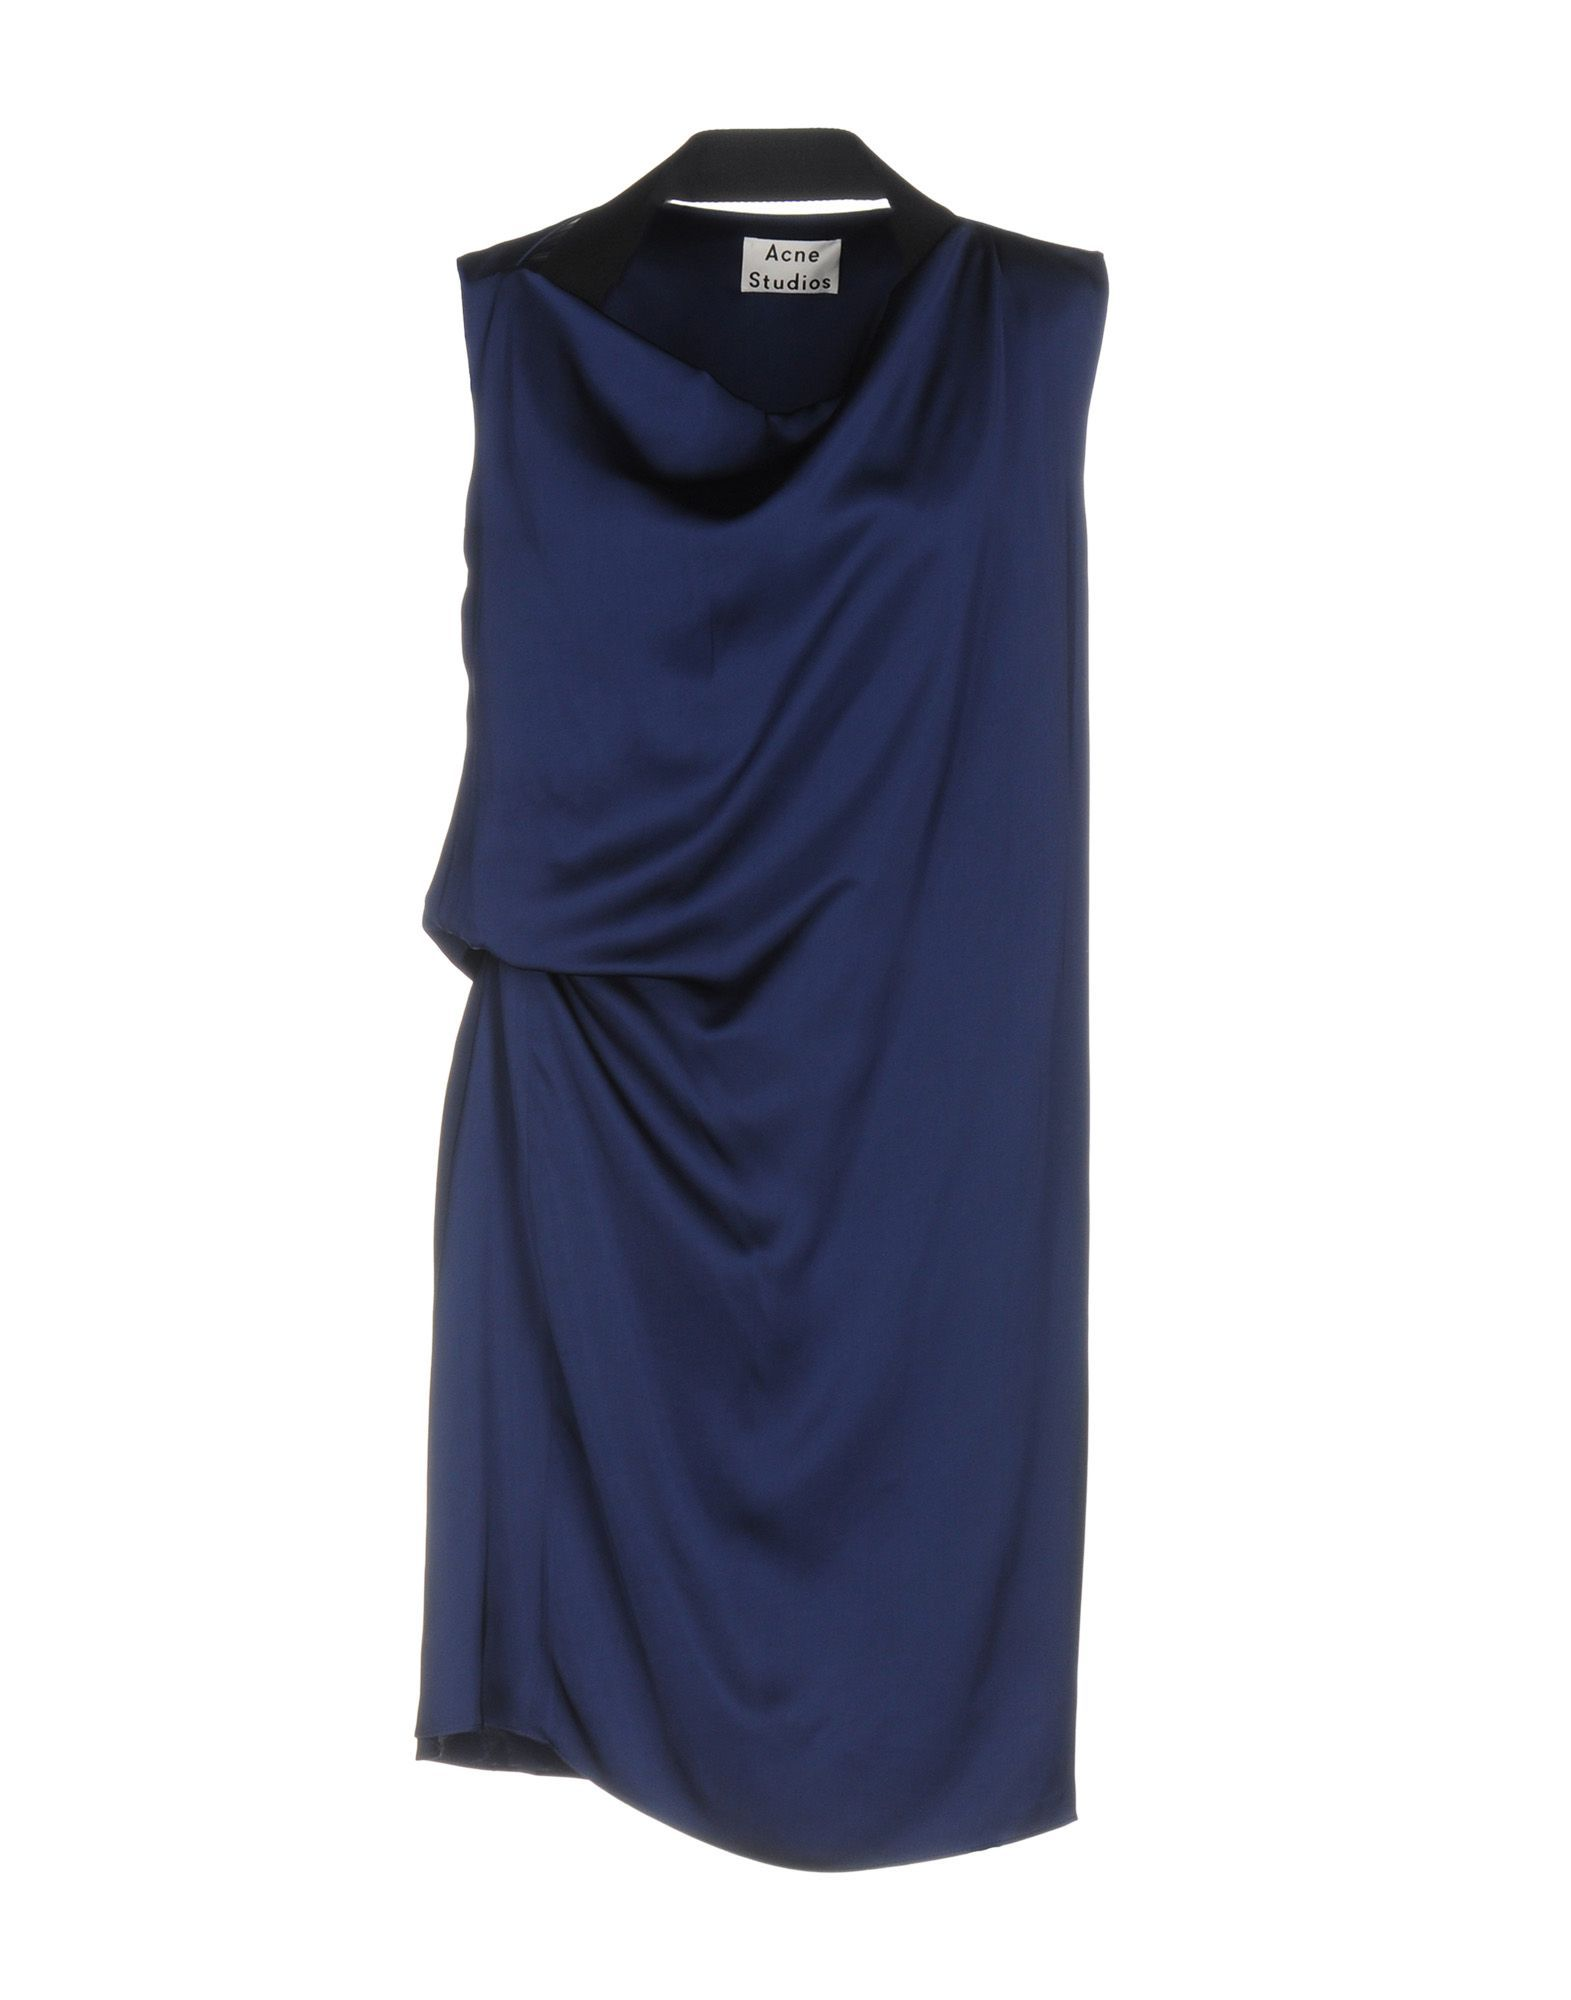 Acne Studios Dark Blue Draped Short Dress